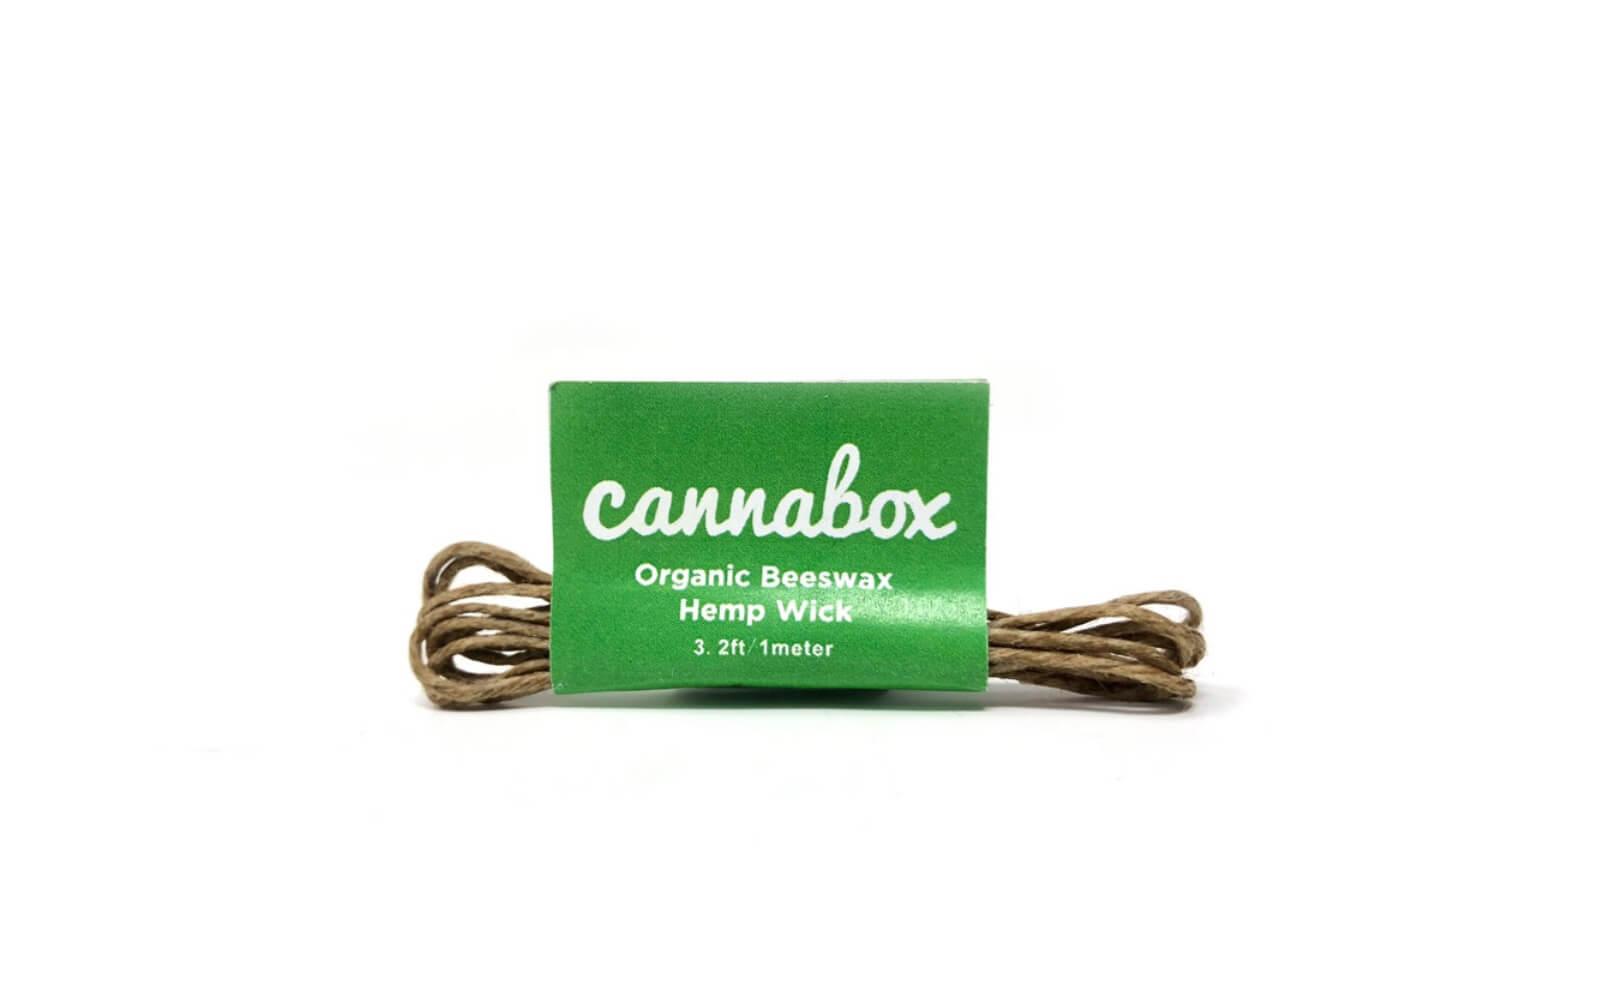 Hemp Wick by Cannabox